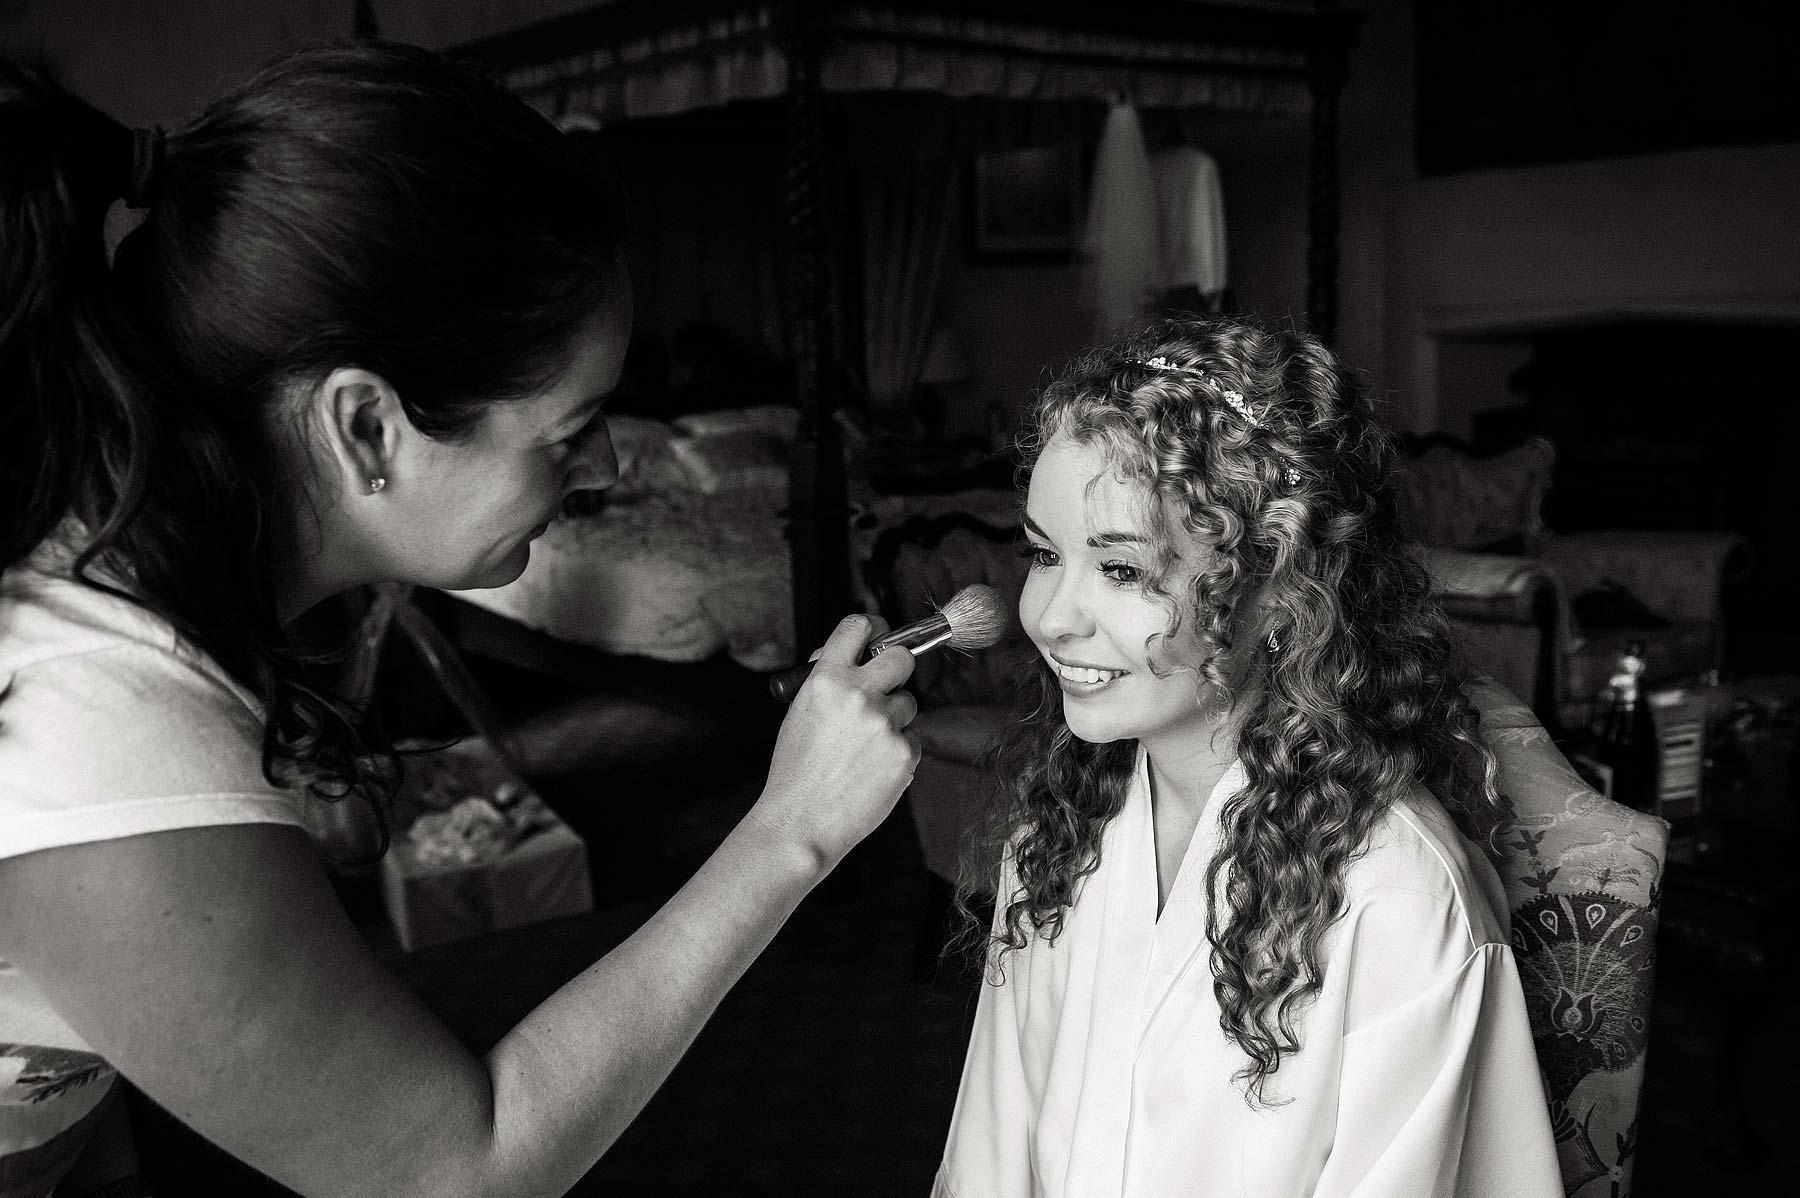 albright-hussey-manor-wedding-photographers-006